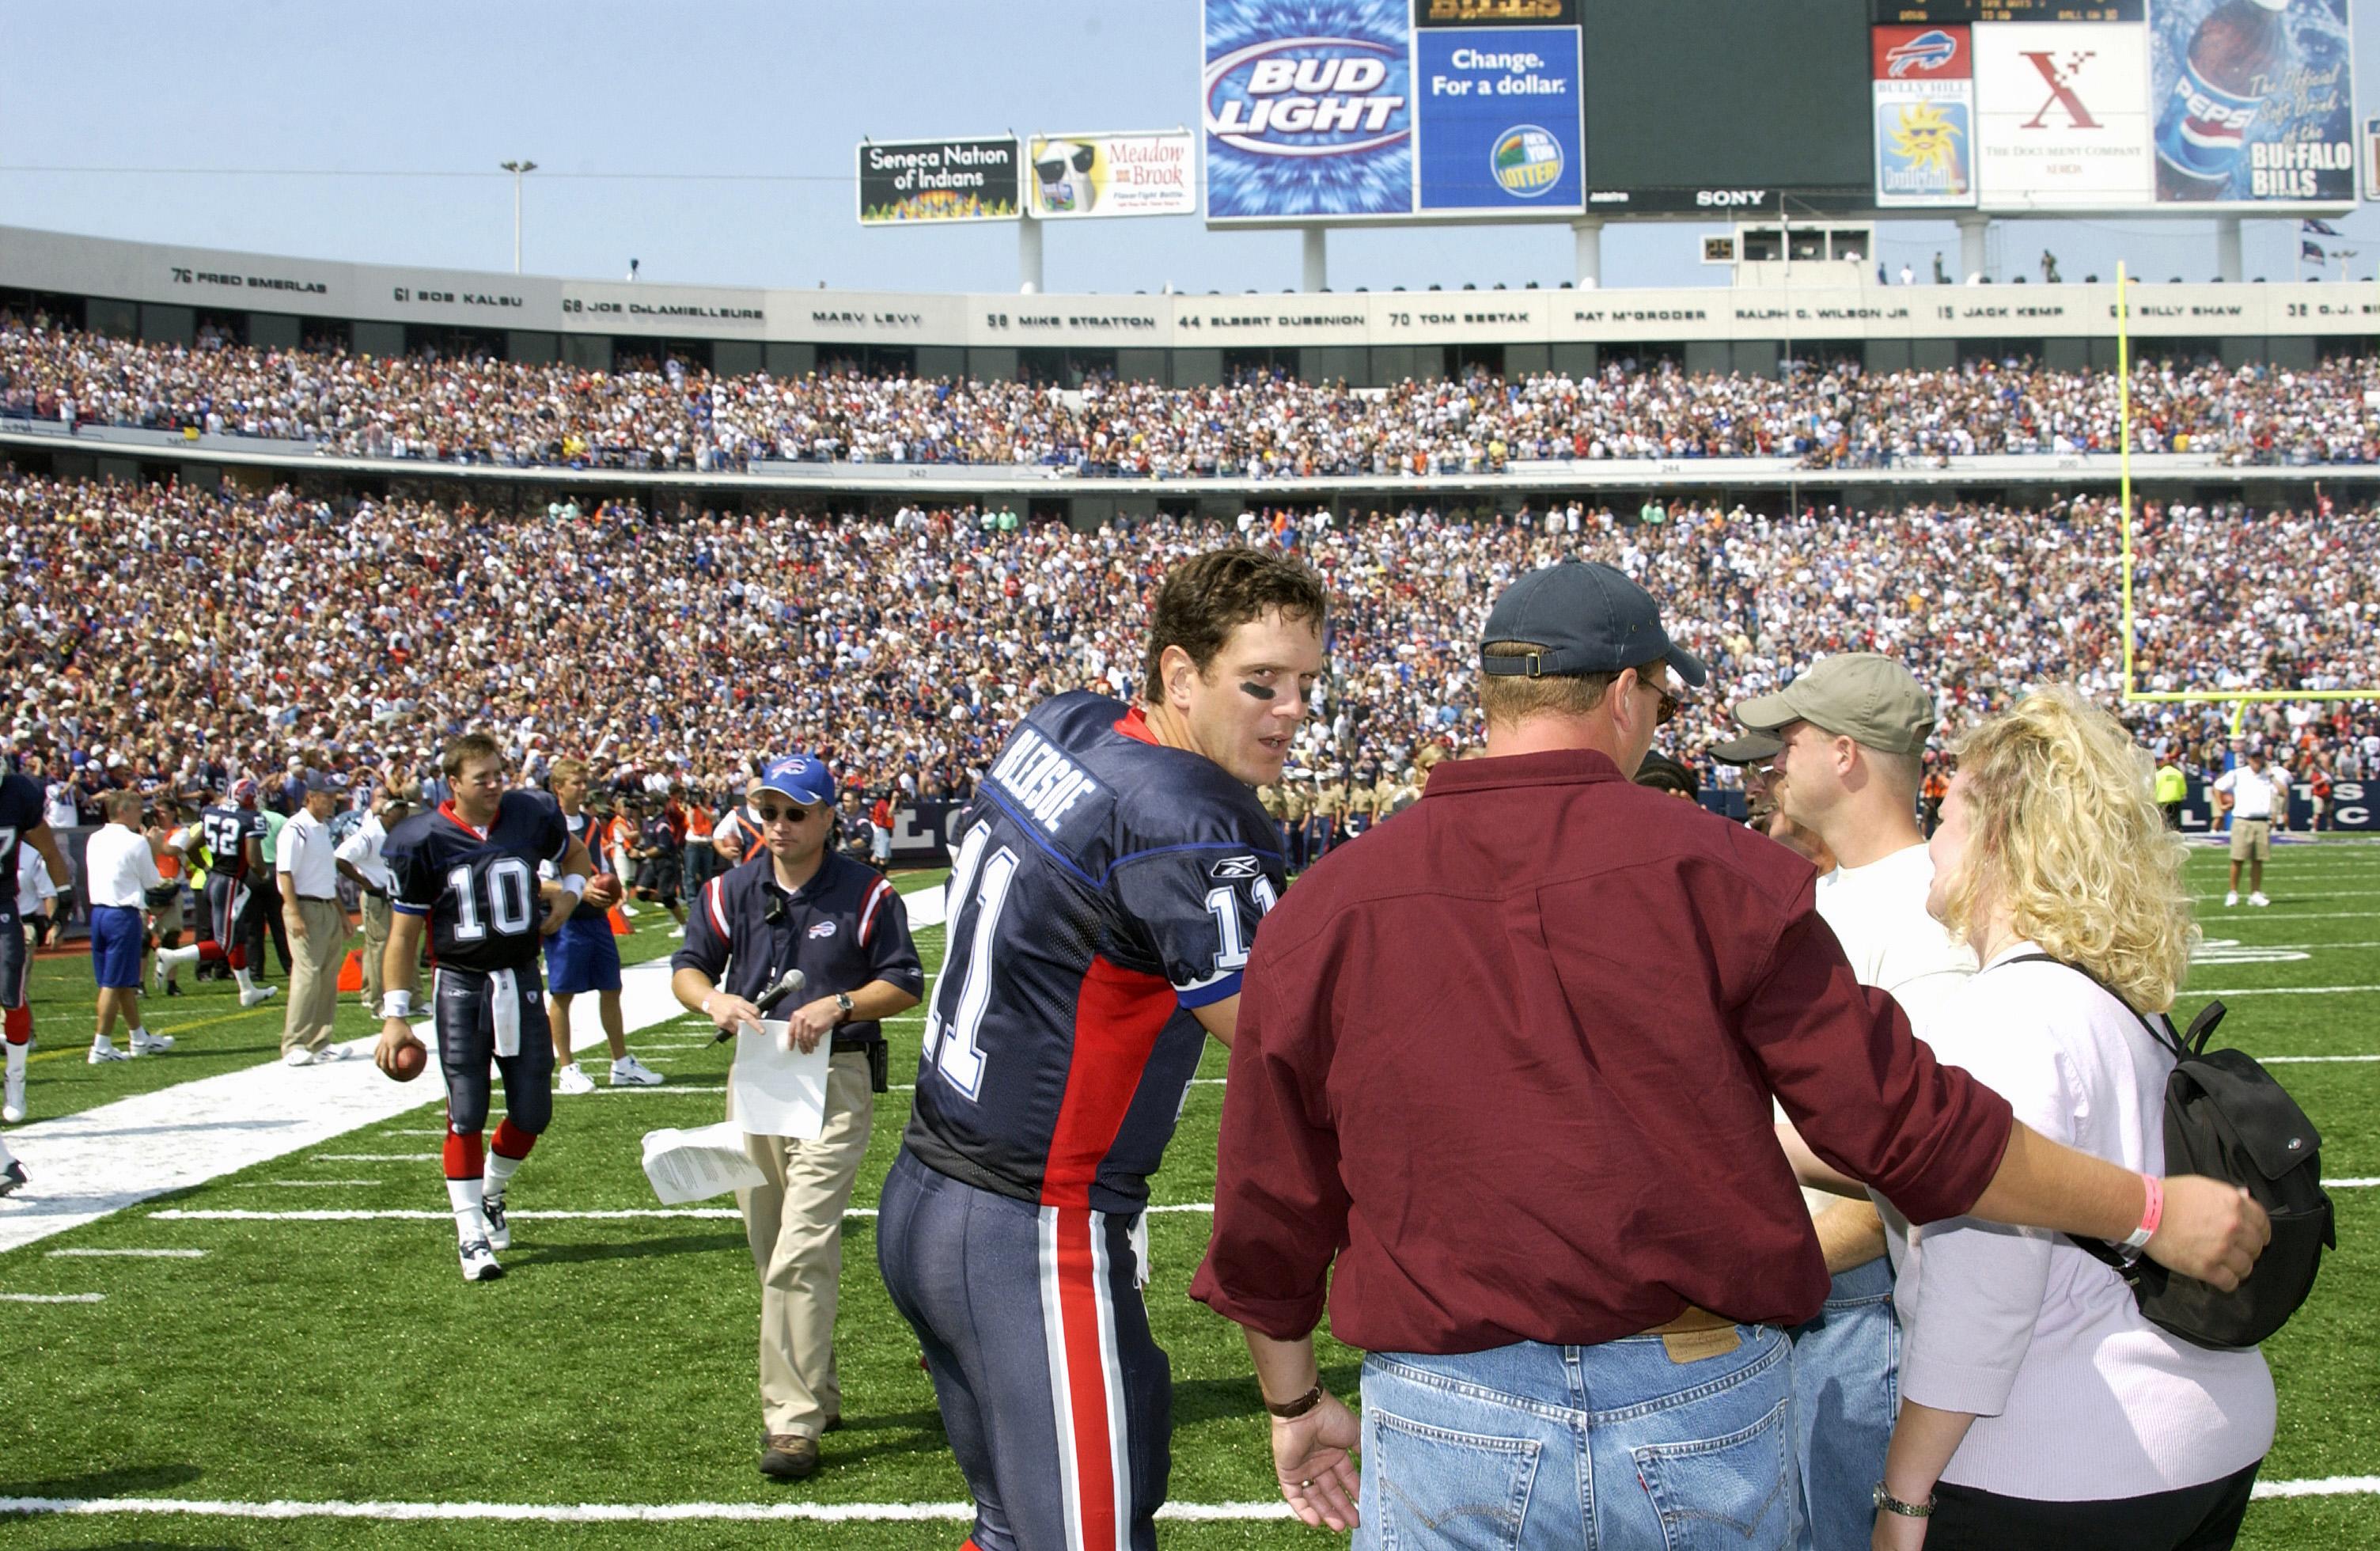 e4f0ab90 2003 Buffalo Bills season - Wikipedia